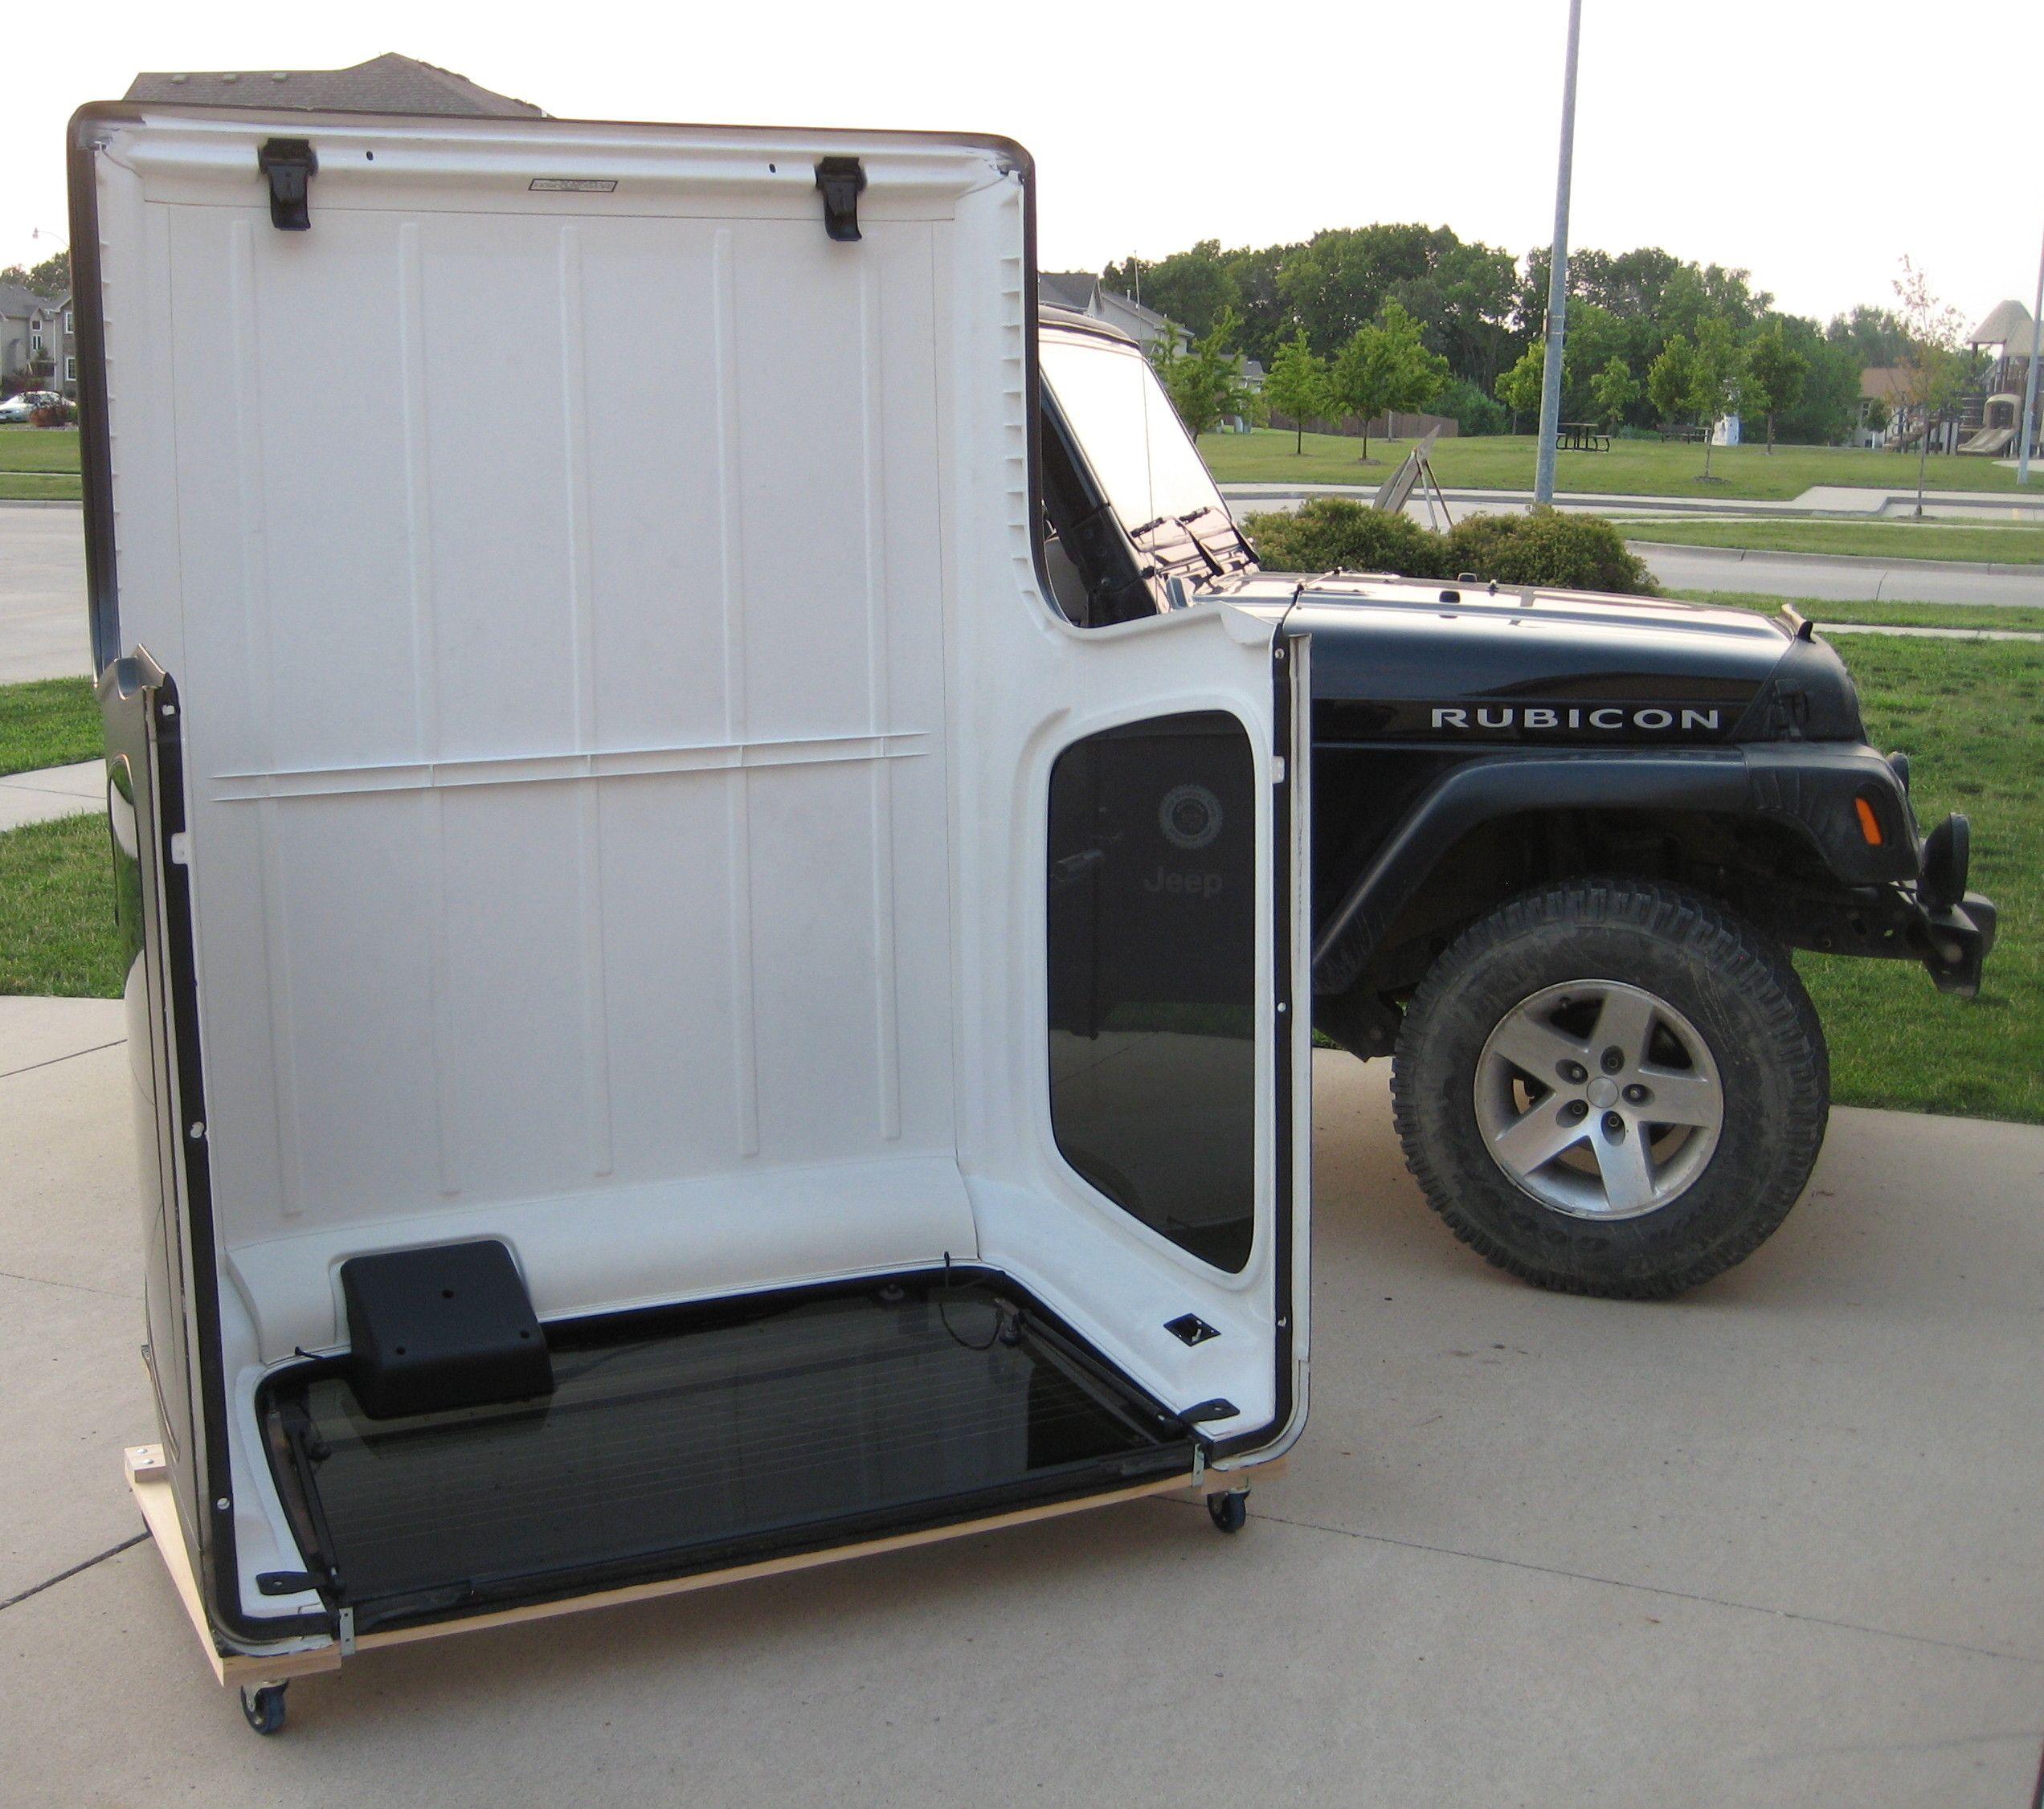 Tj Lj Yj Hardtop Storage Cart Jeep Hardtop Storage Jeep